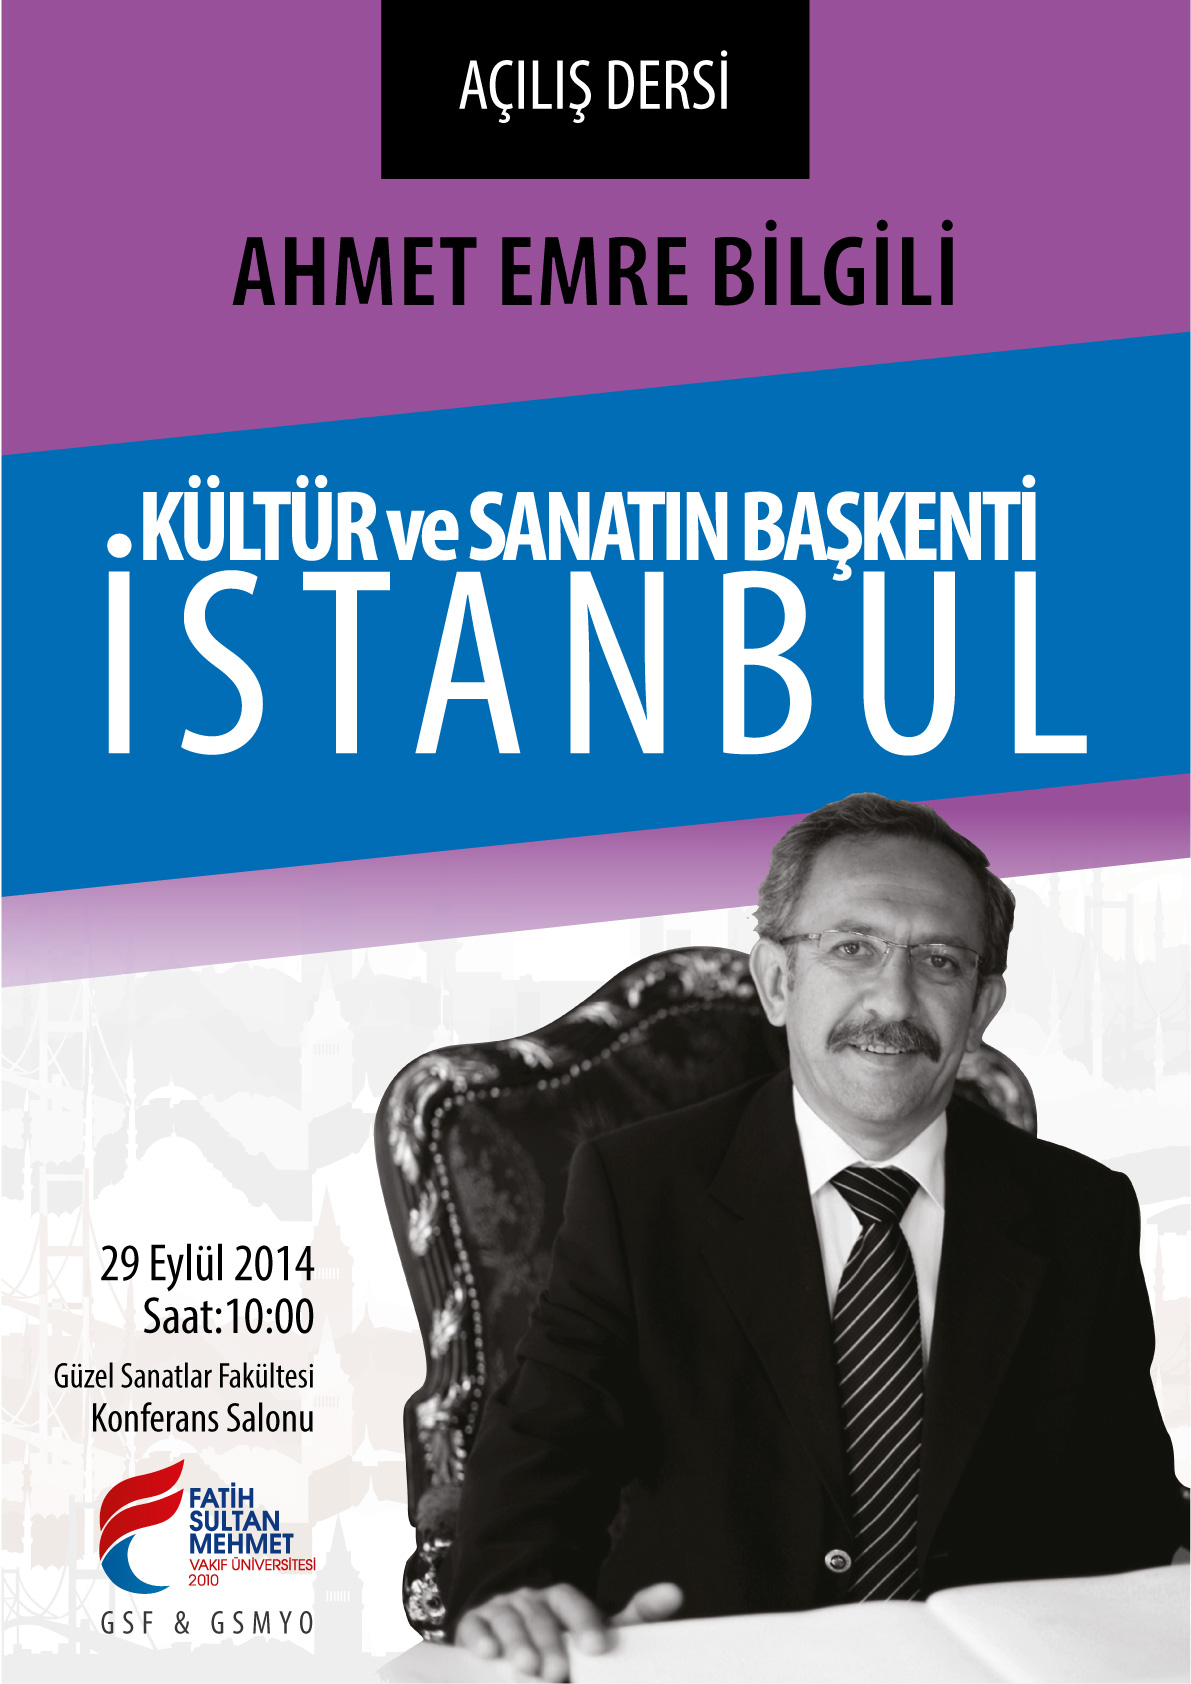 http://gsmyo.tomer.fsm.edu.tr/resimler/upload/Kultur-ve-Sanatin-Baskenti-Istanbul-Konulu-Acilis-Dersi-1240914.jpg